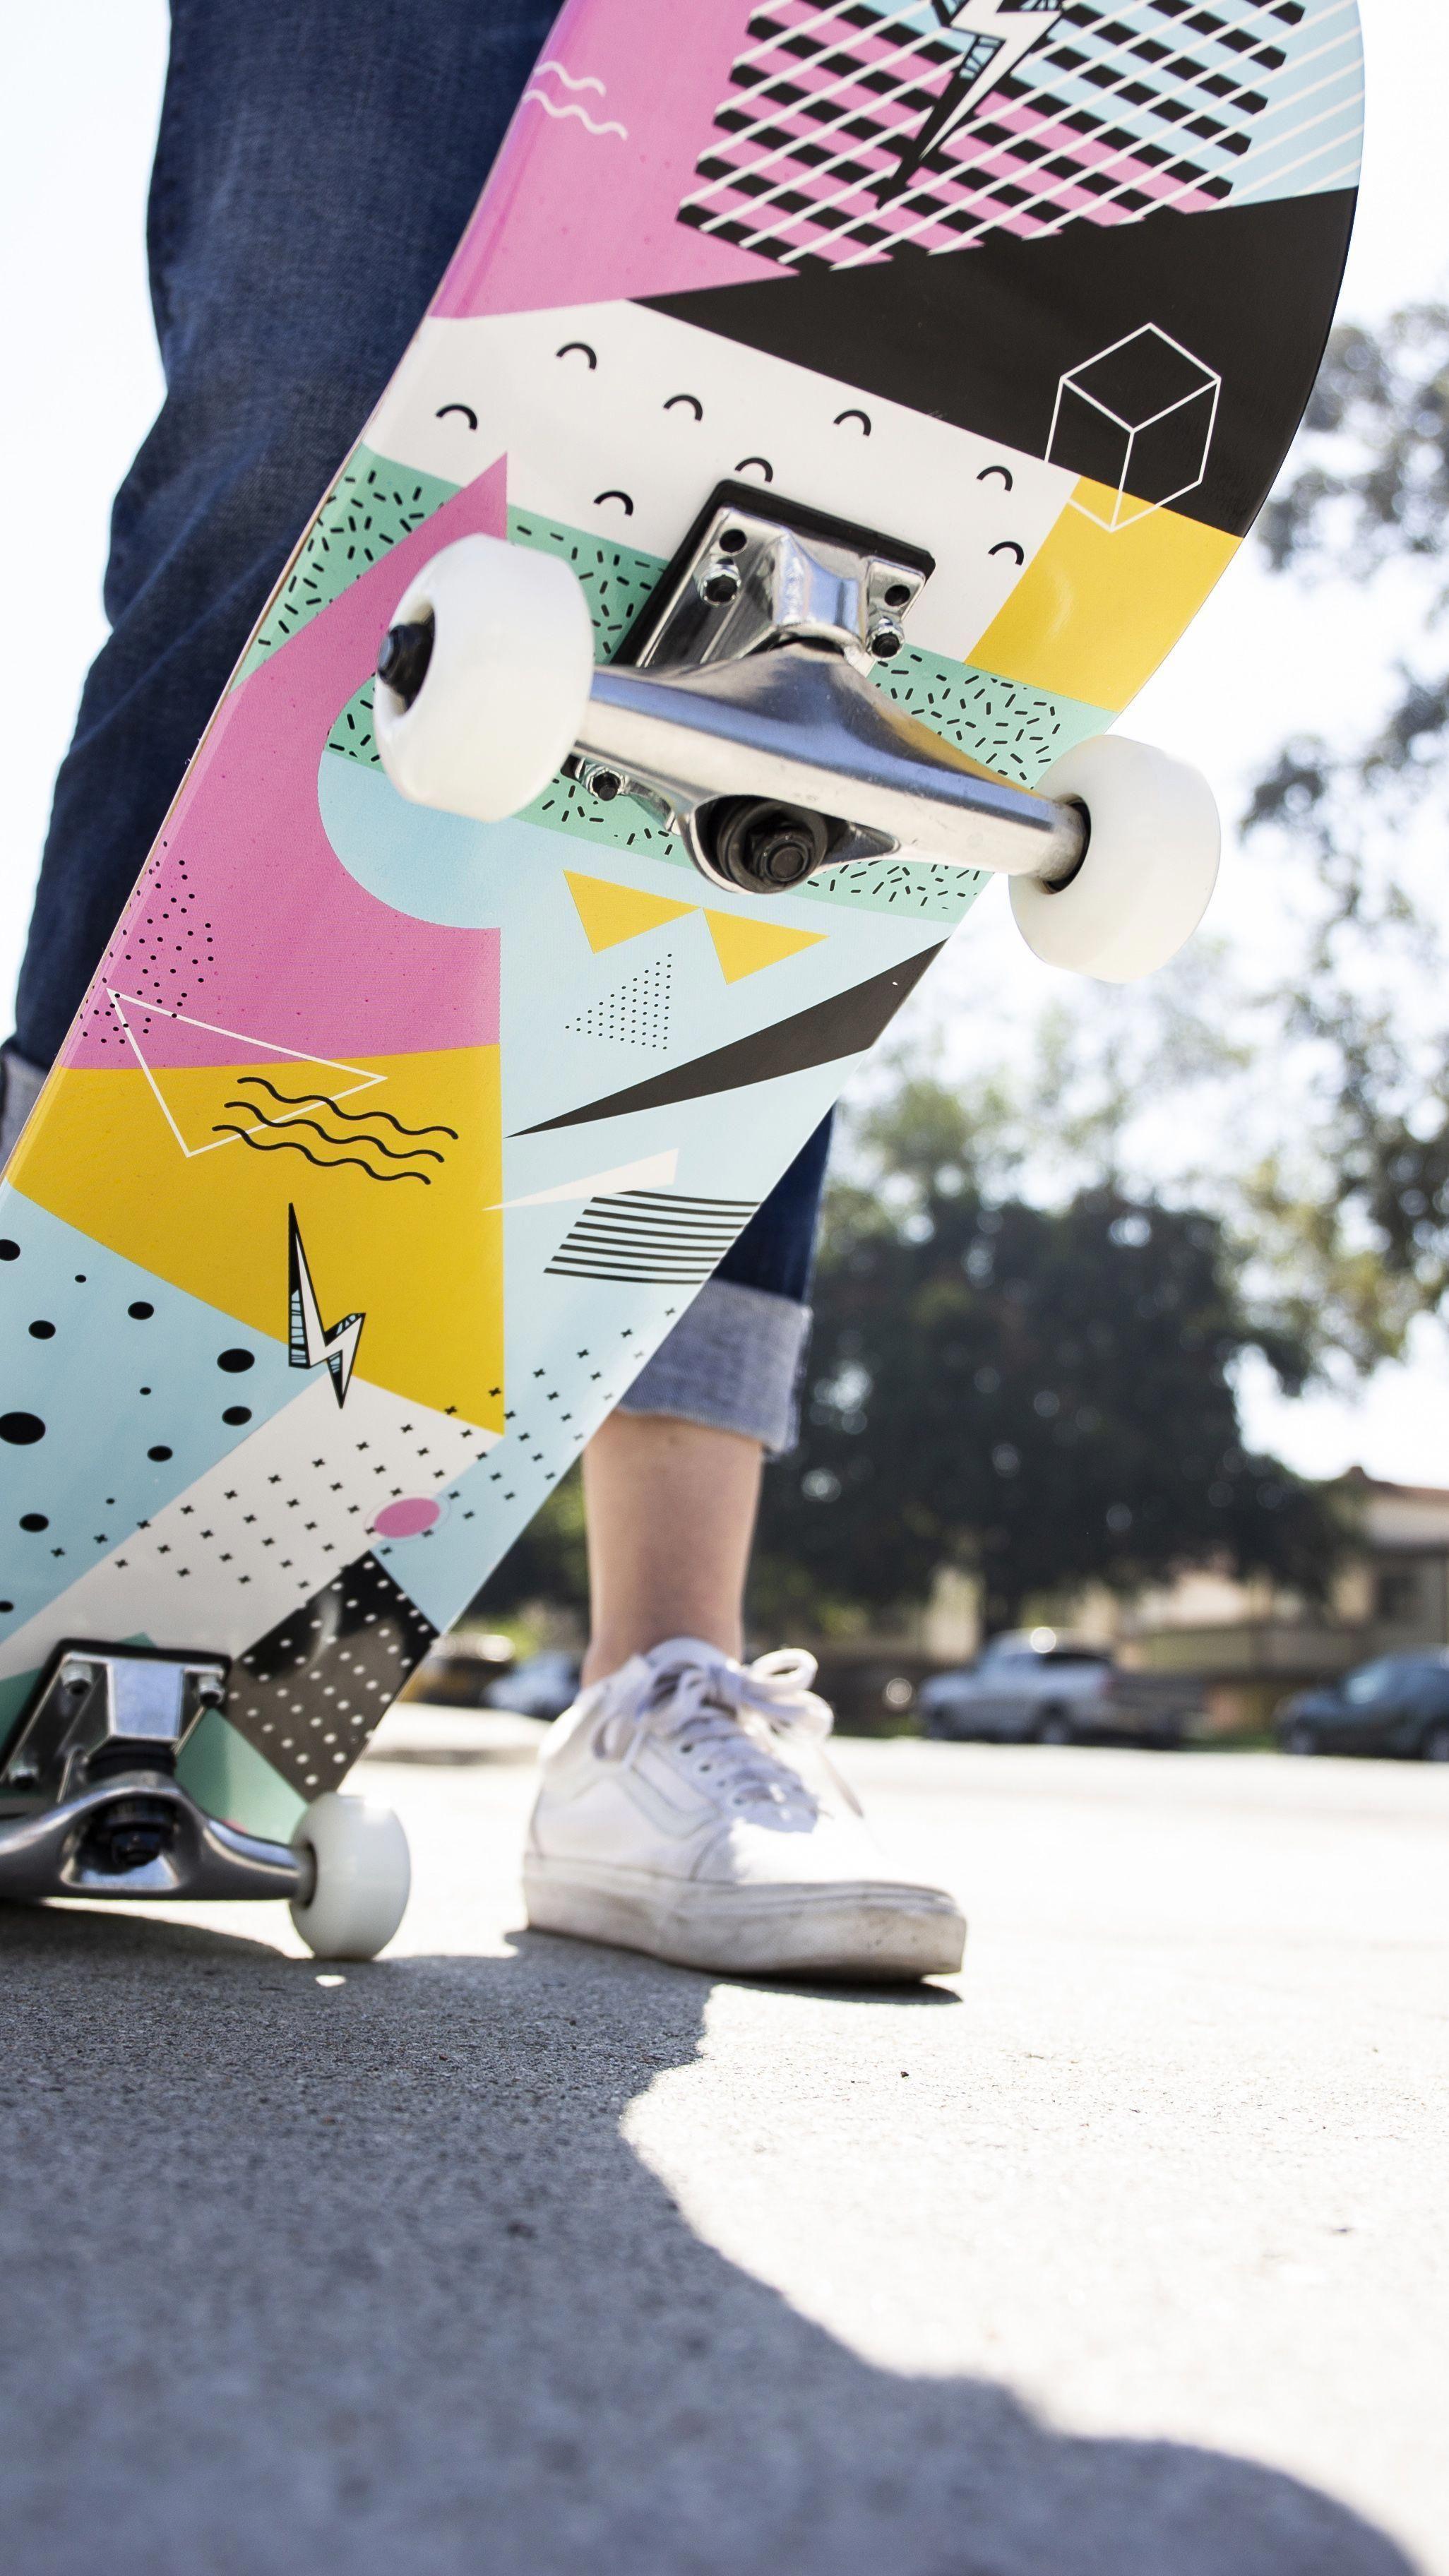 skateboards hella nocturnalabstract longboard christmasday